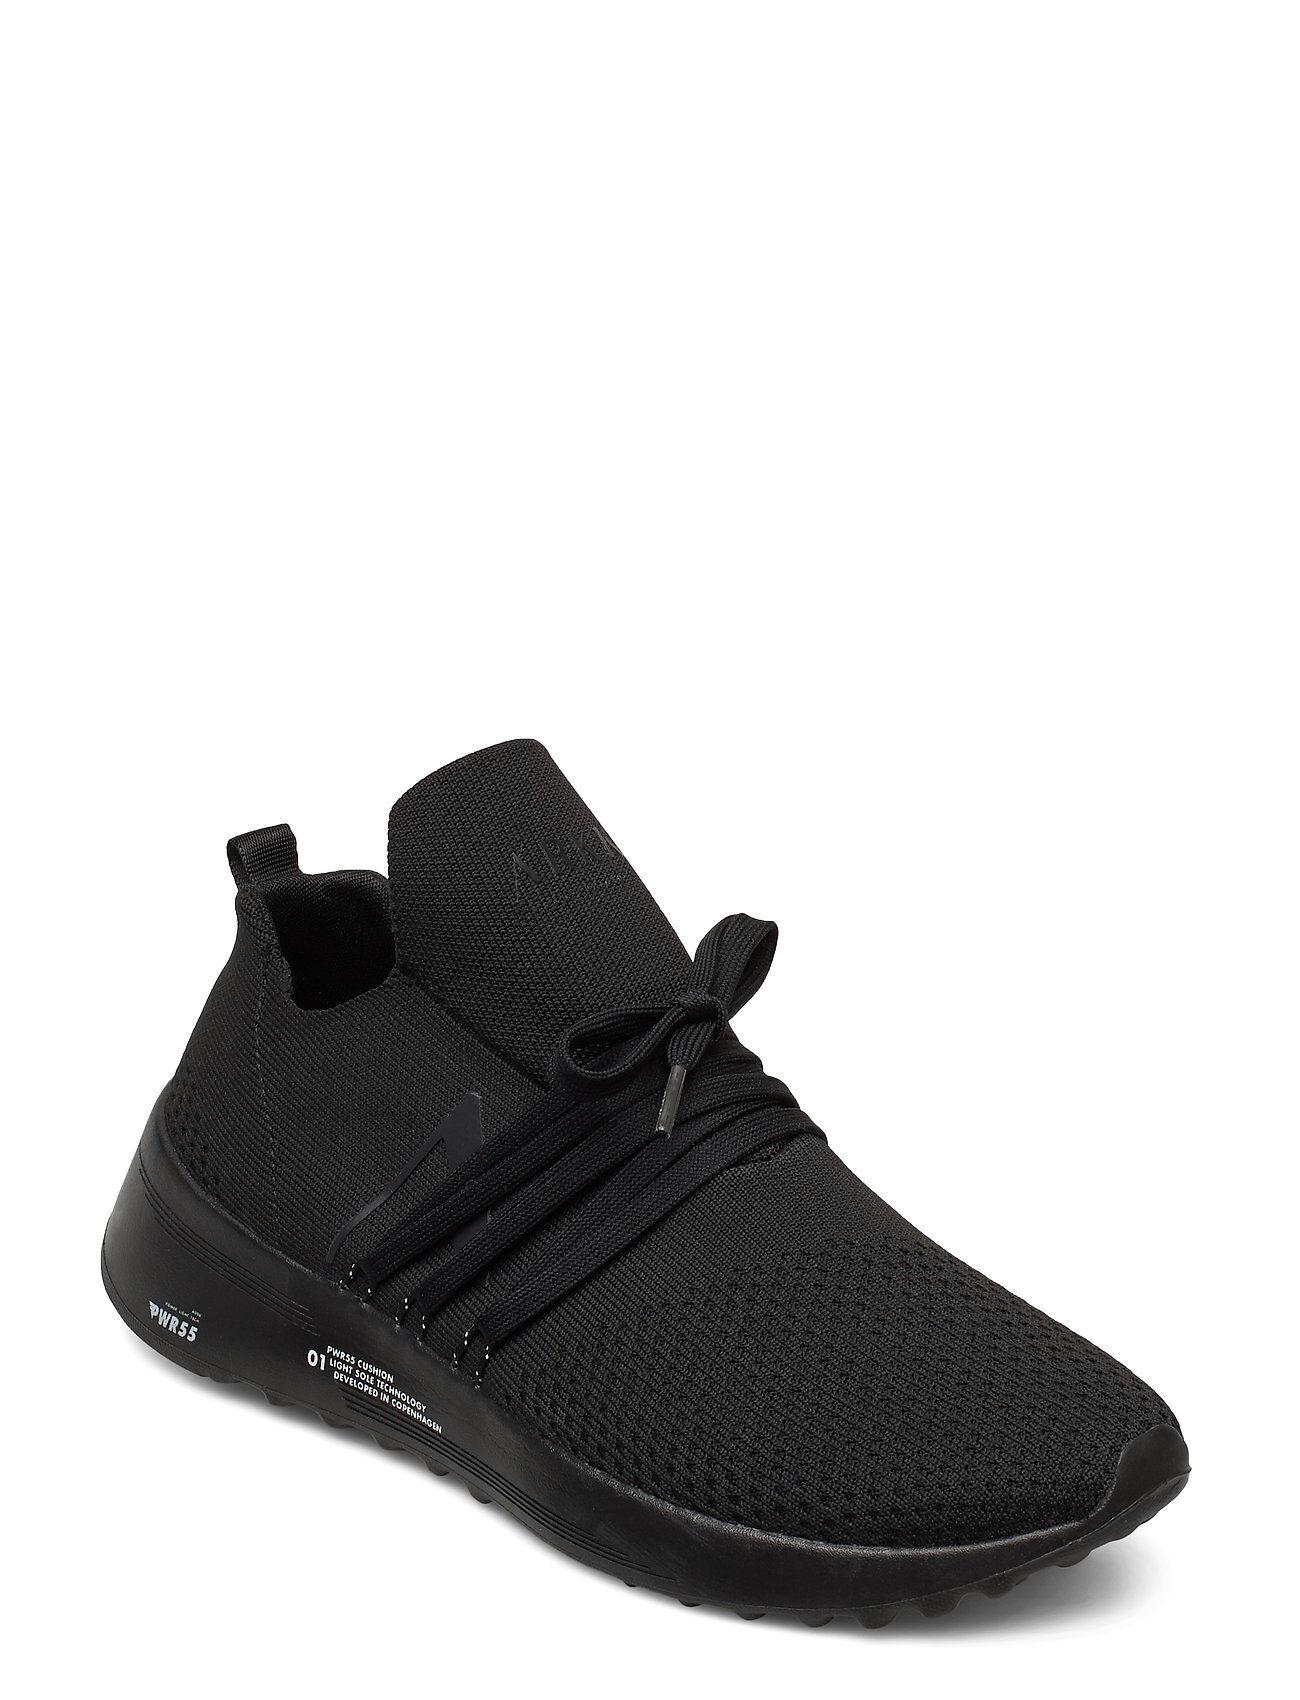 ARKK Copenhagen Raven Fg 2.0 Pwr55 Black White - Me Matalavartiset Sneakerit Tennarit Musta ARKK Copenhagen